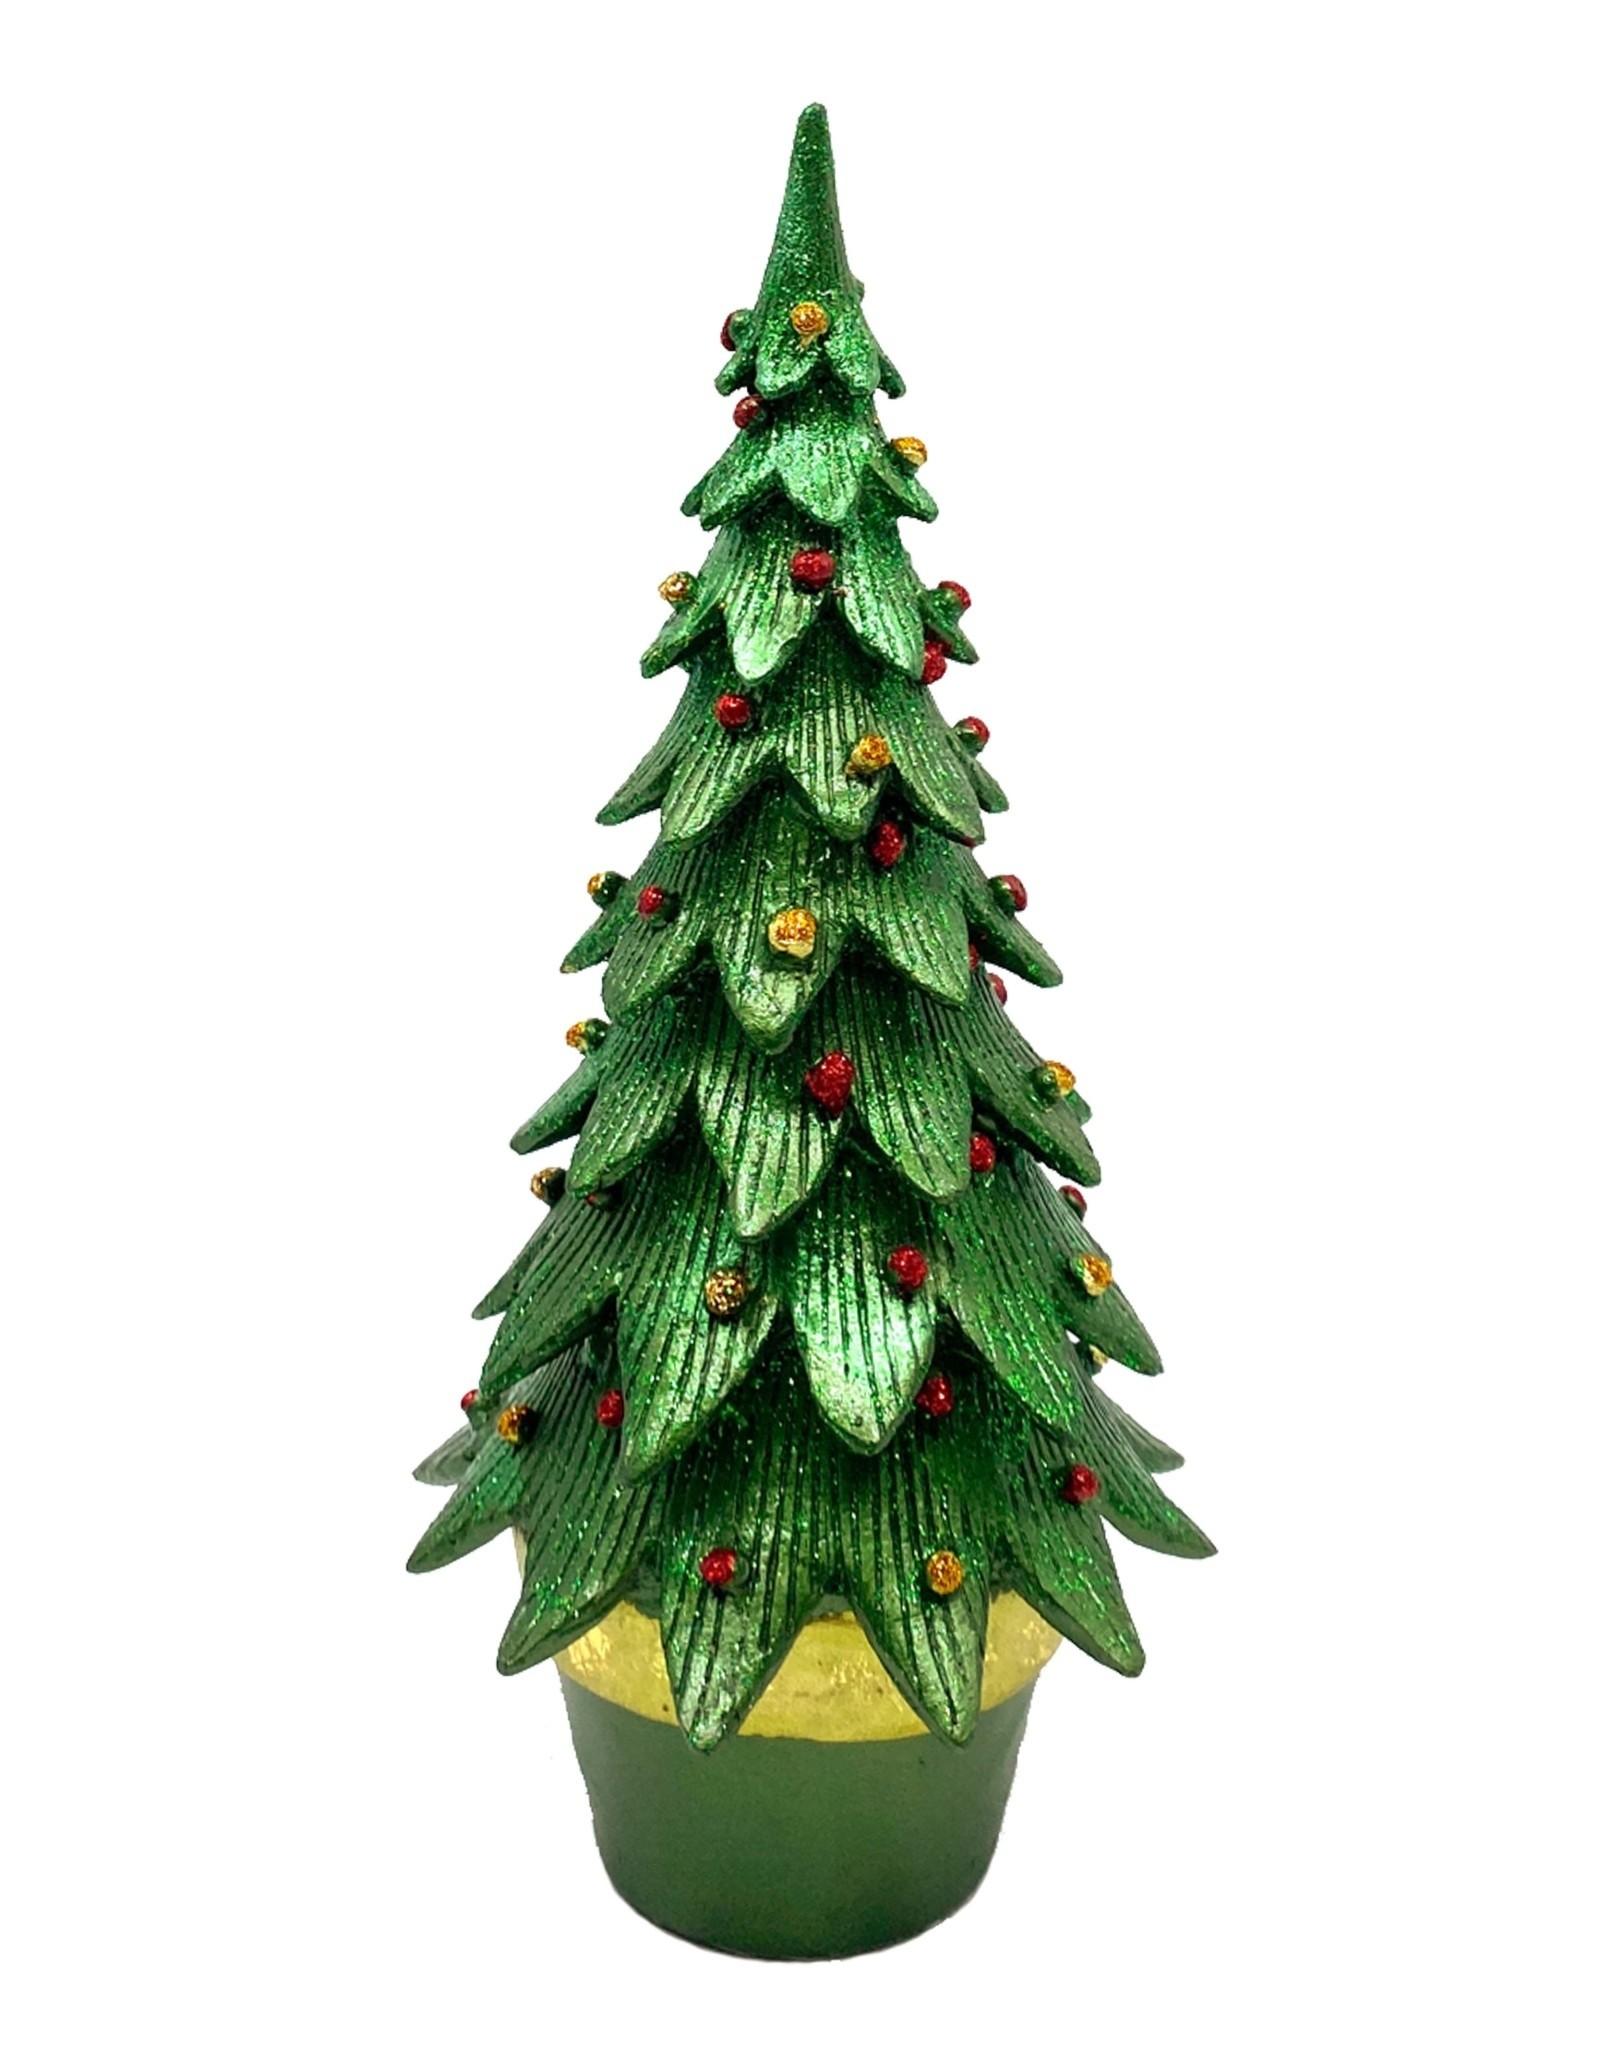 DEKORASYON SMALL TANNENBAUM CONE TREE